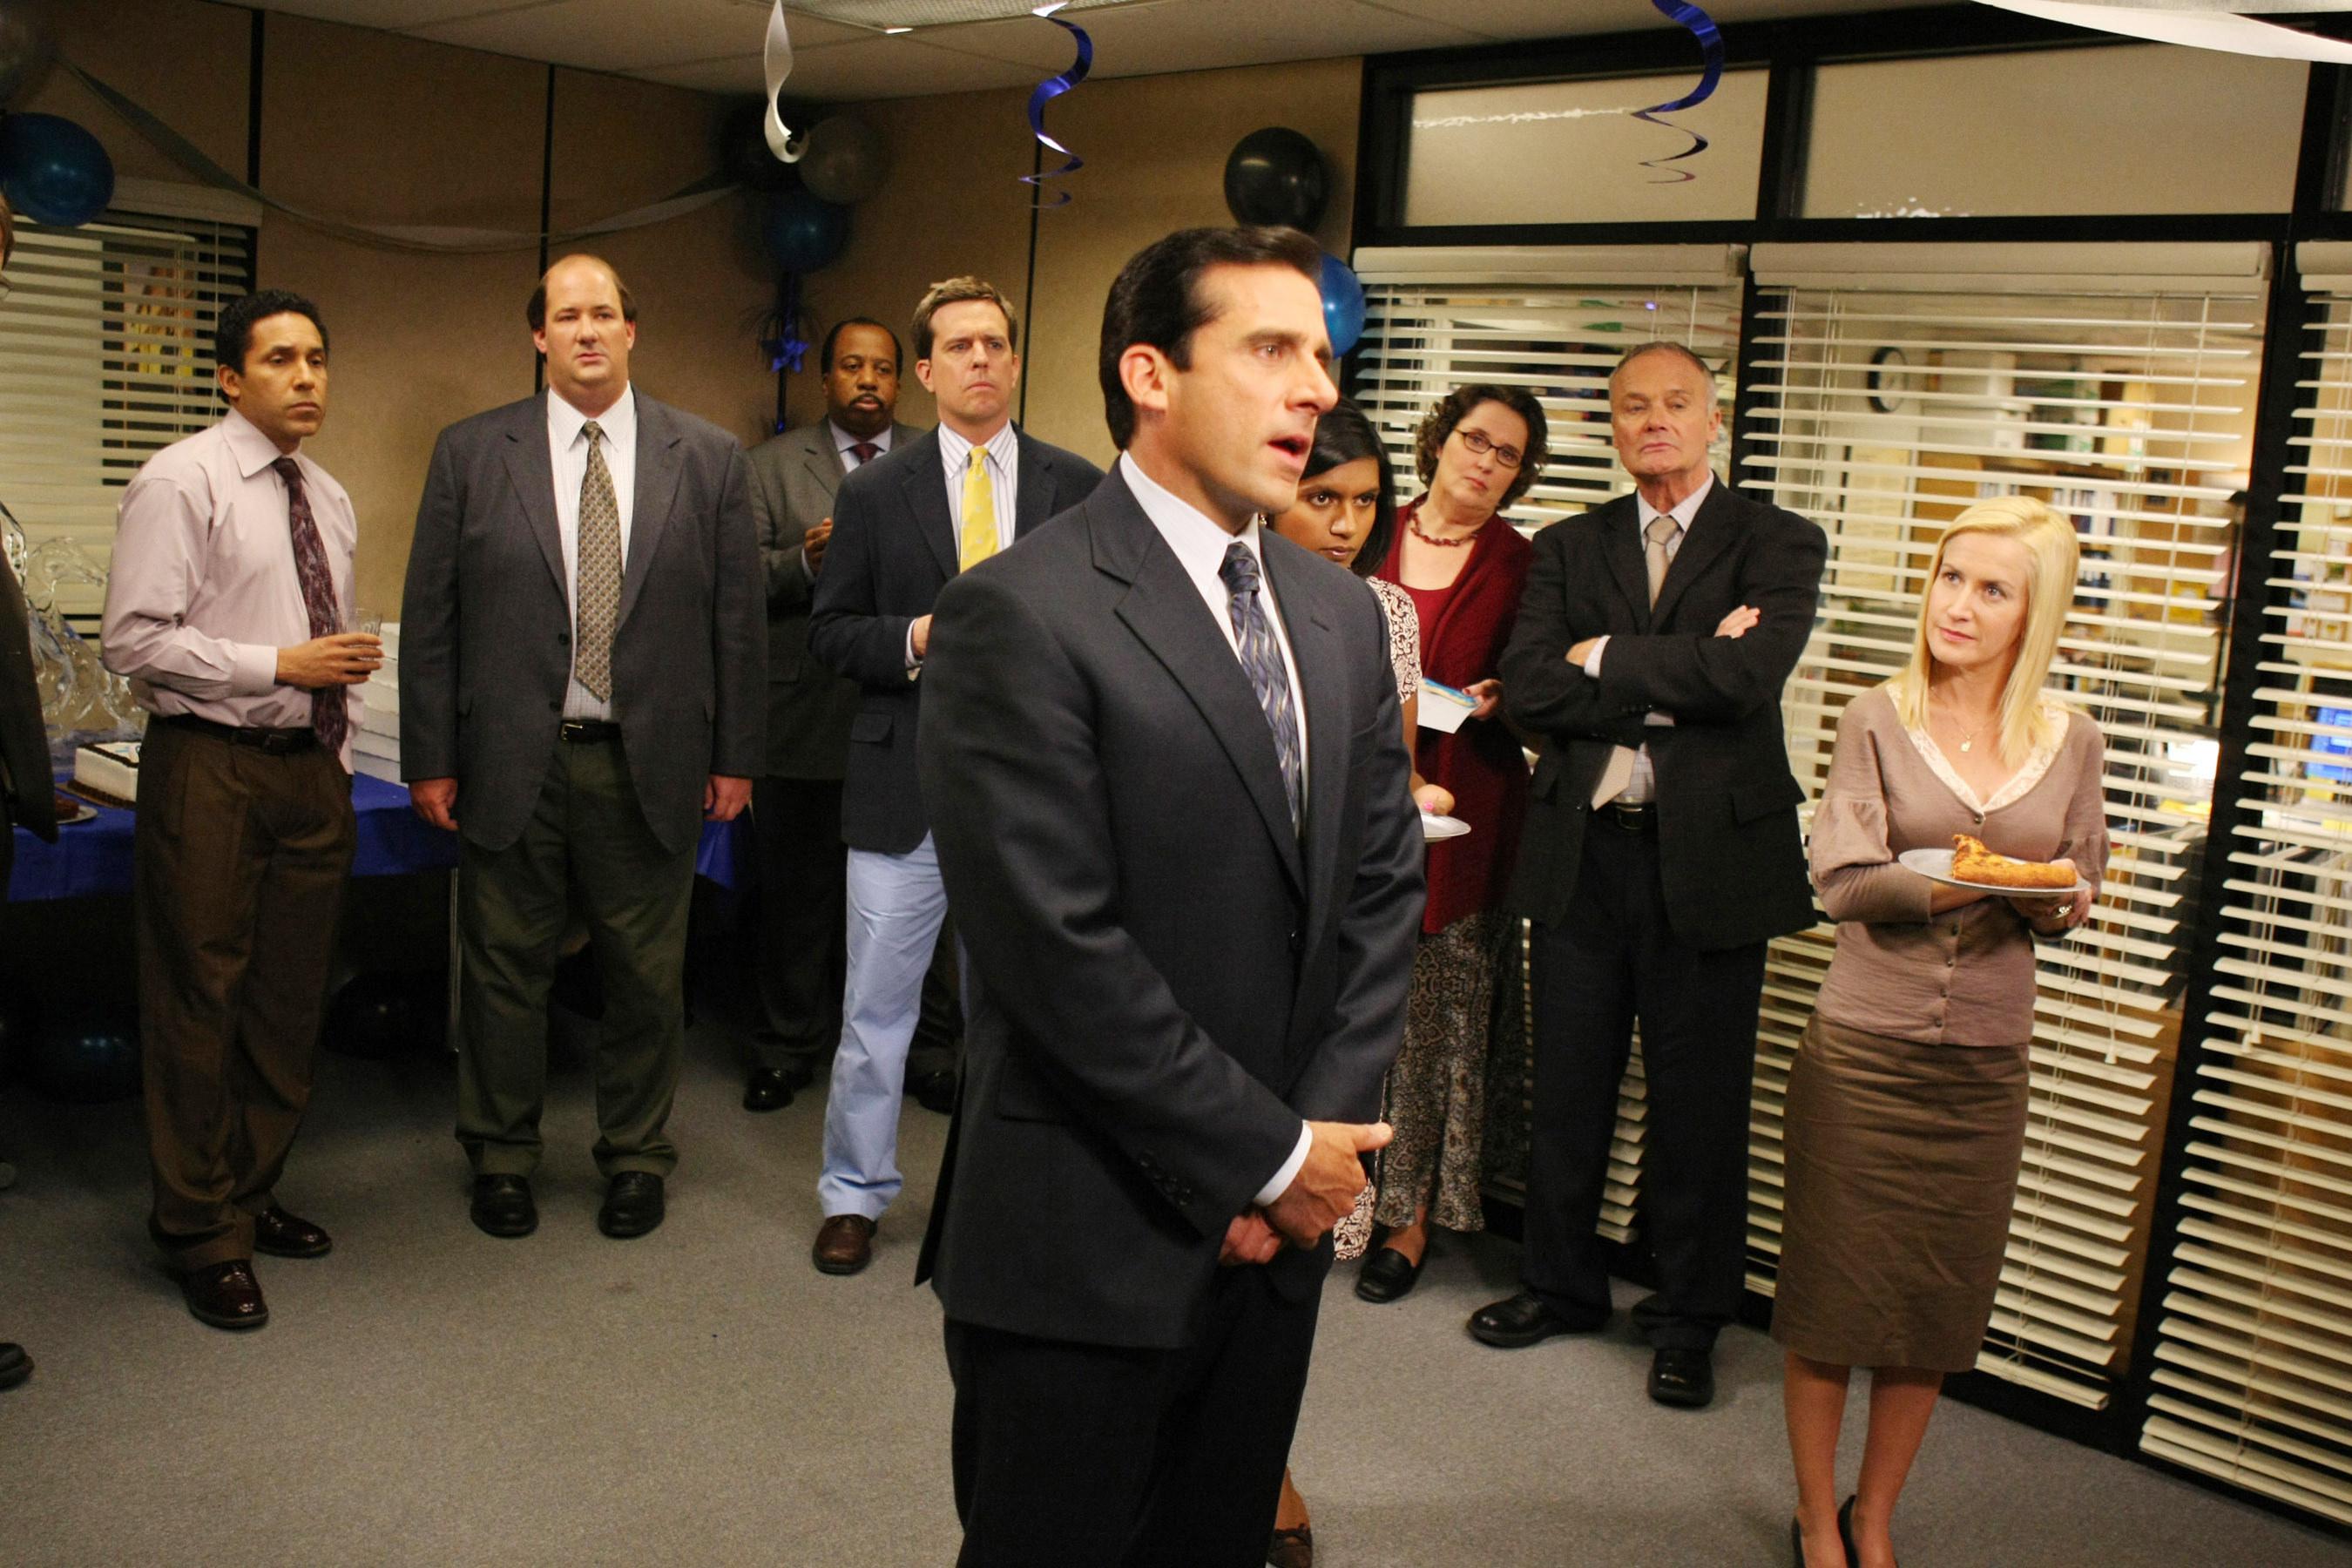 Steve Carrell gives a speech at an office party